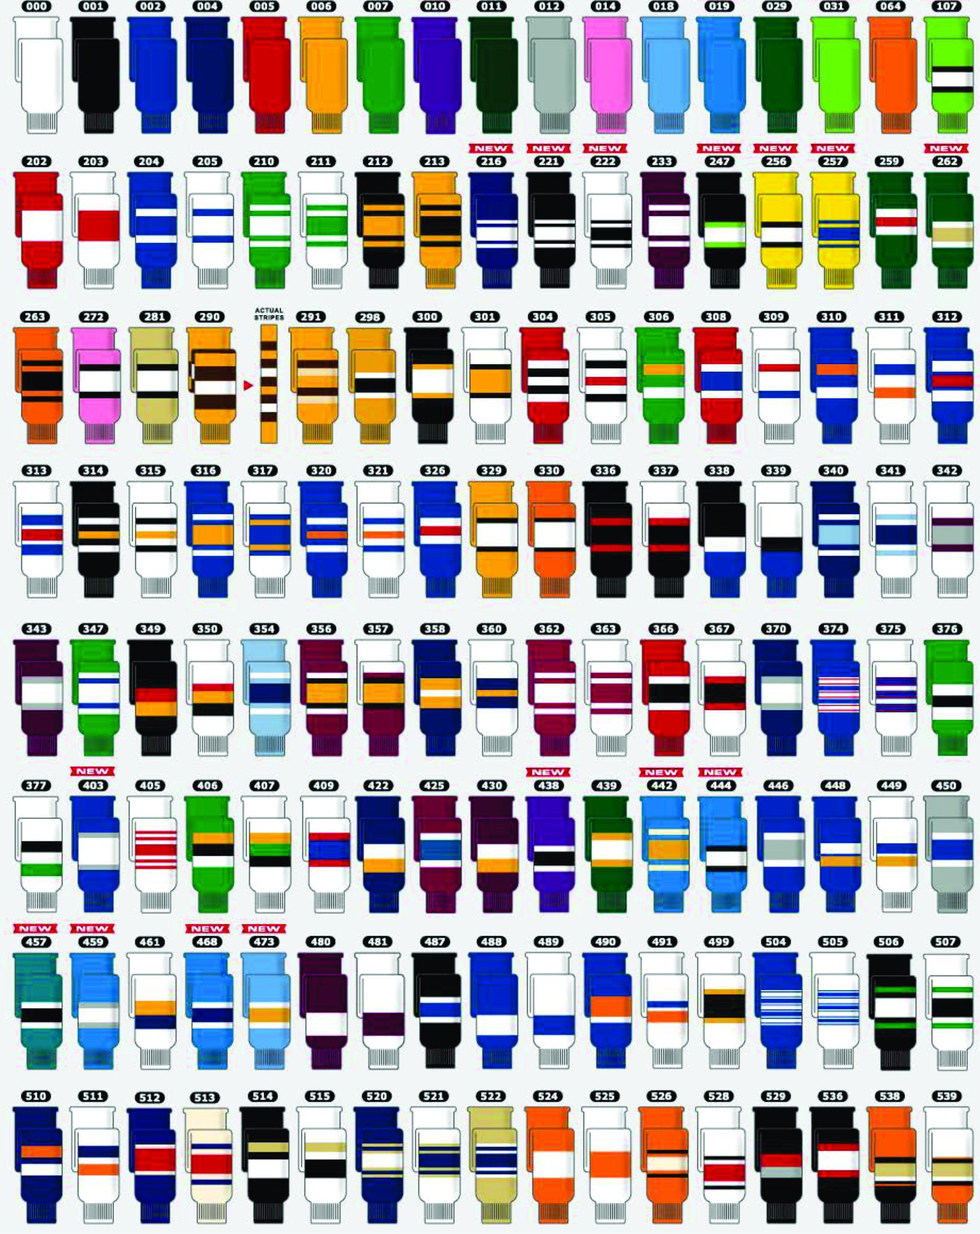 socks4_2048x2048.jpg